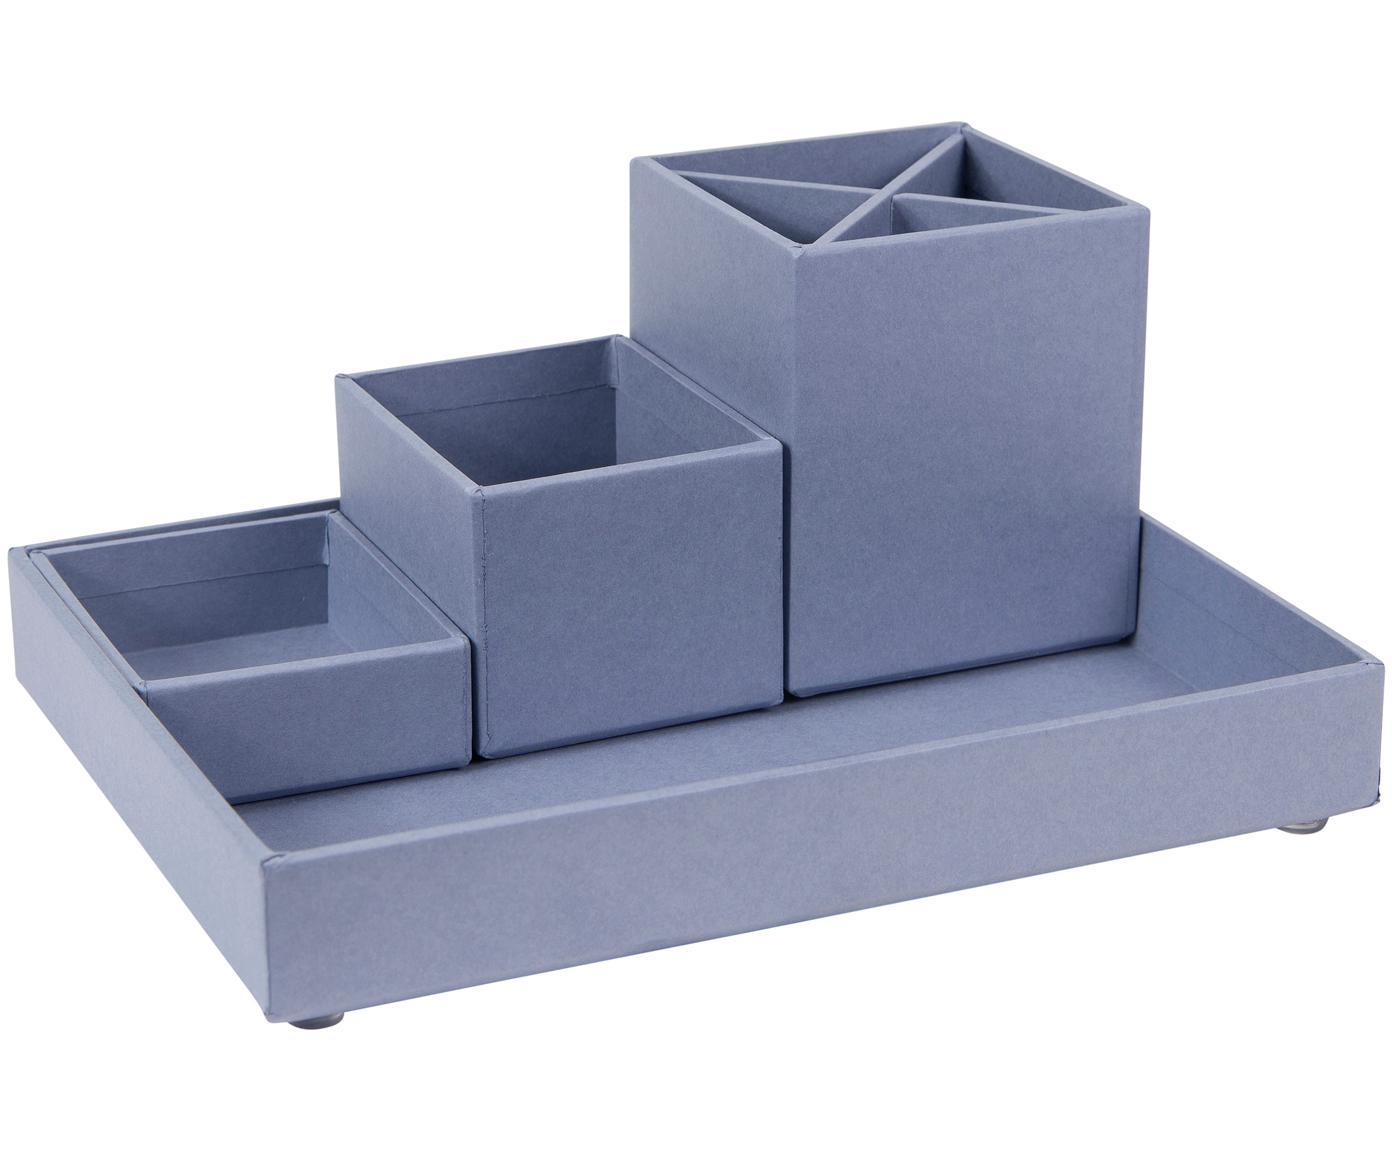 Bureau organizerset Lena, 4-delig, Massief, gelamineerd karton, Duifblauw, Verschillende formaten